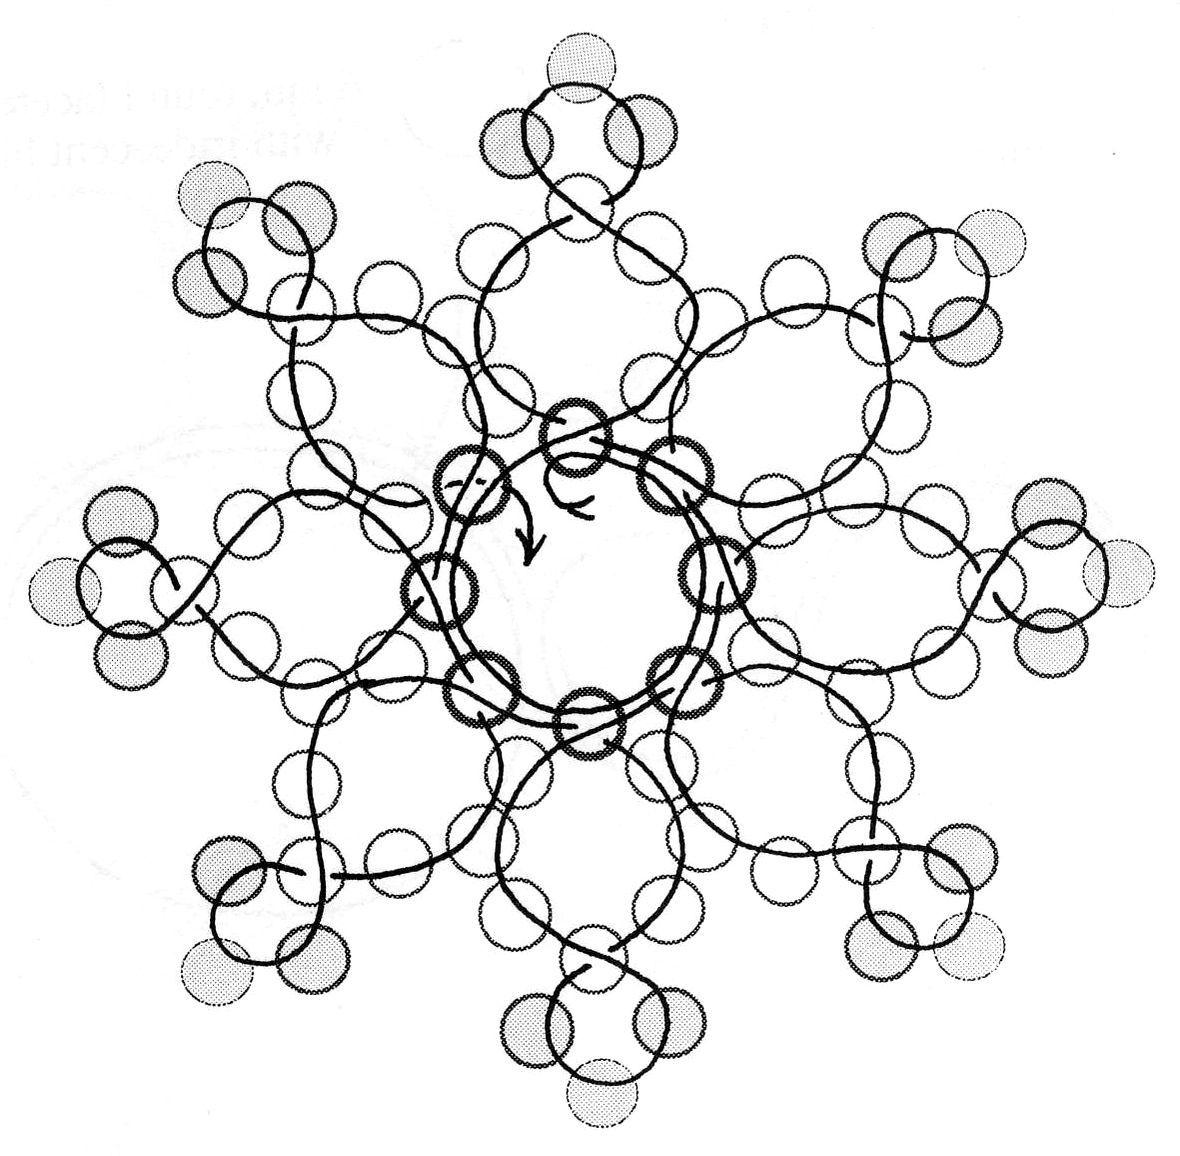 1180x1156 Drawings Drawing Ideas Easy Snowflake Drawing New Easy Snowflake